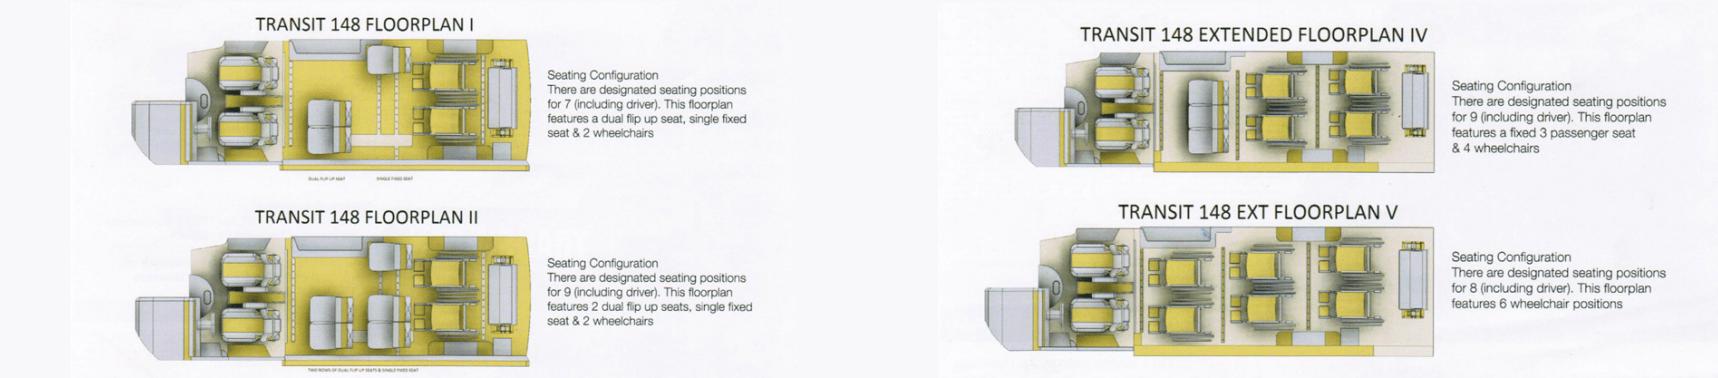 Full Sized Transit Van Floorplans